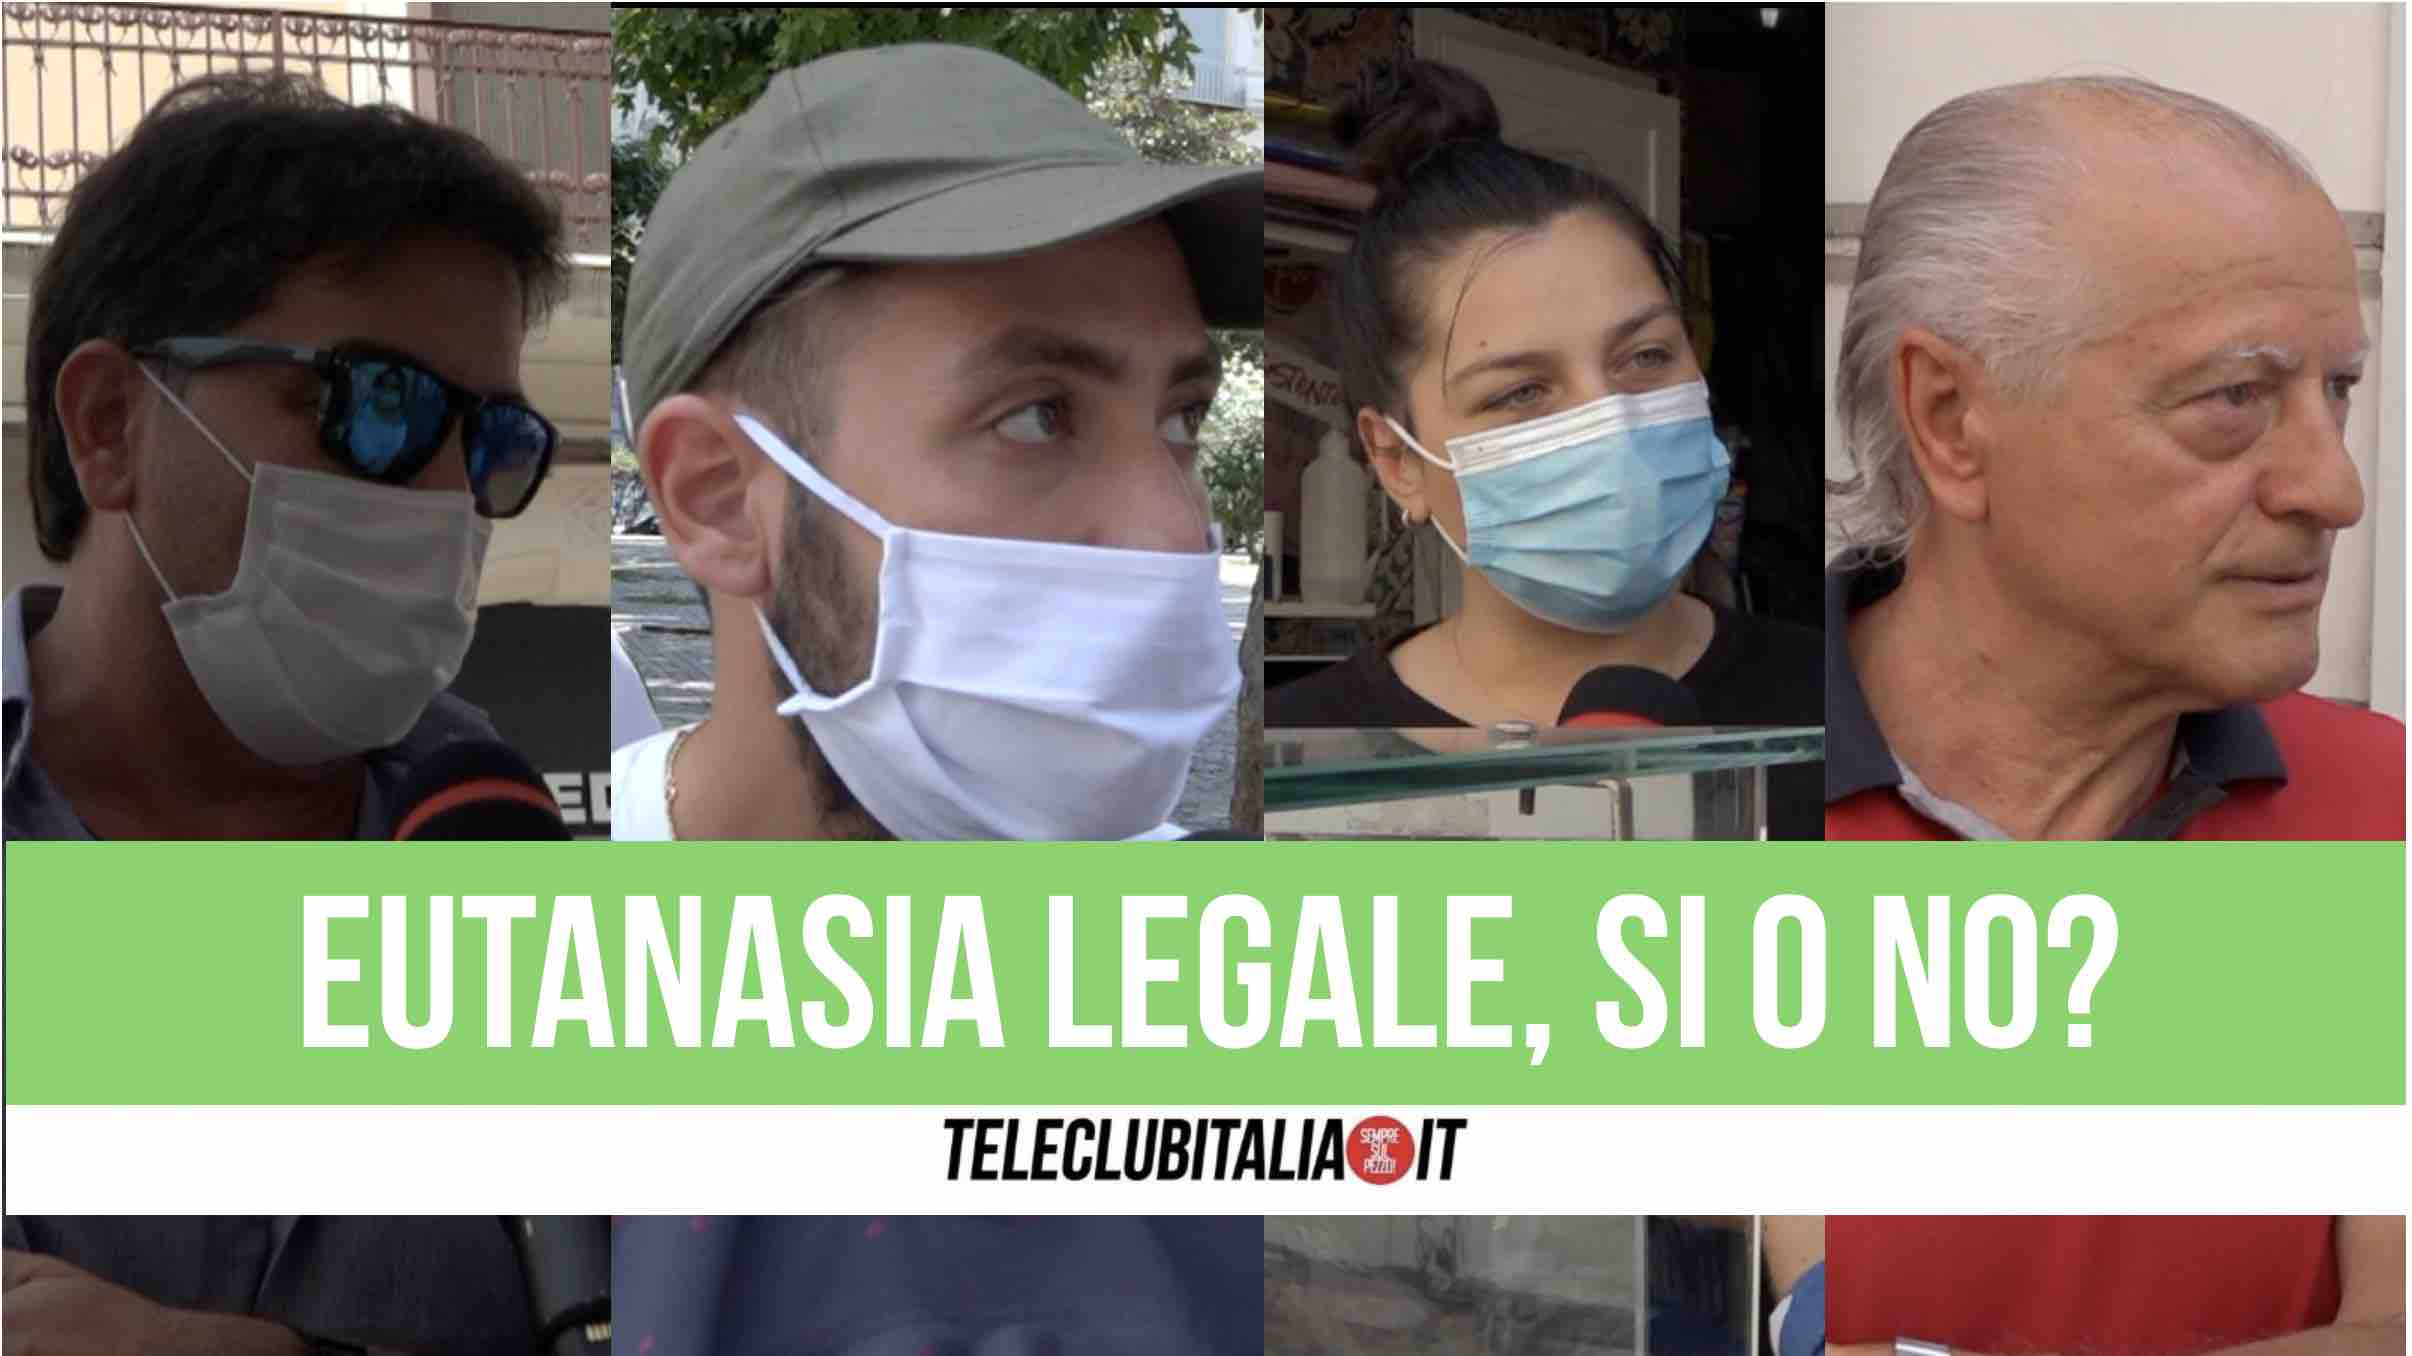 eutanasia legale radicali aversa liceo cirillo